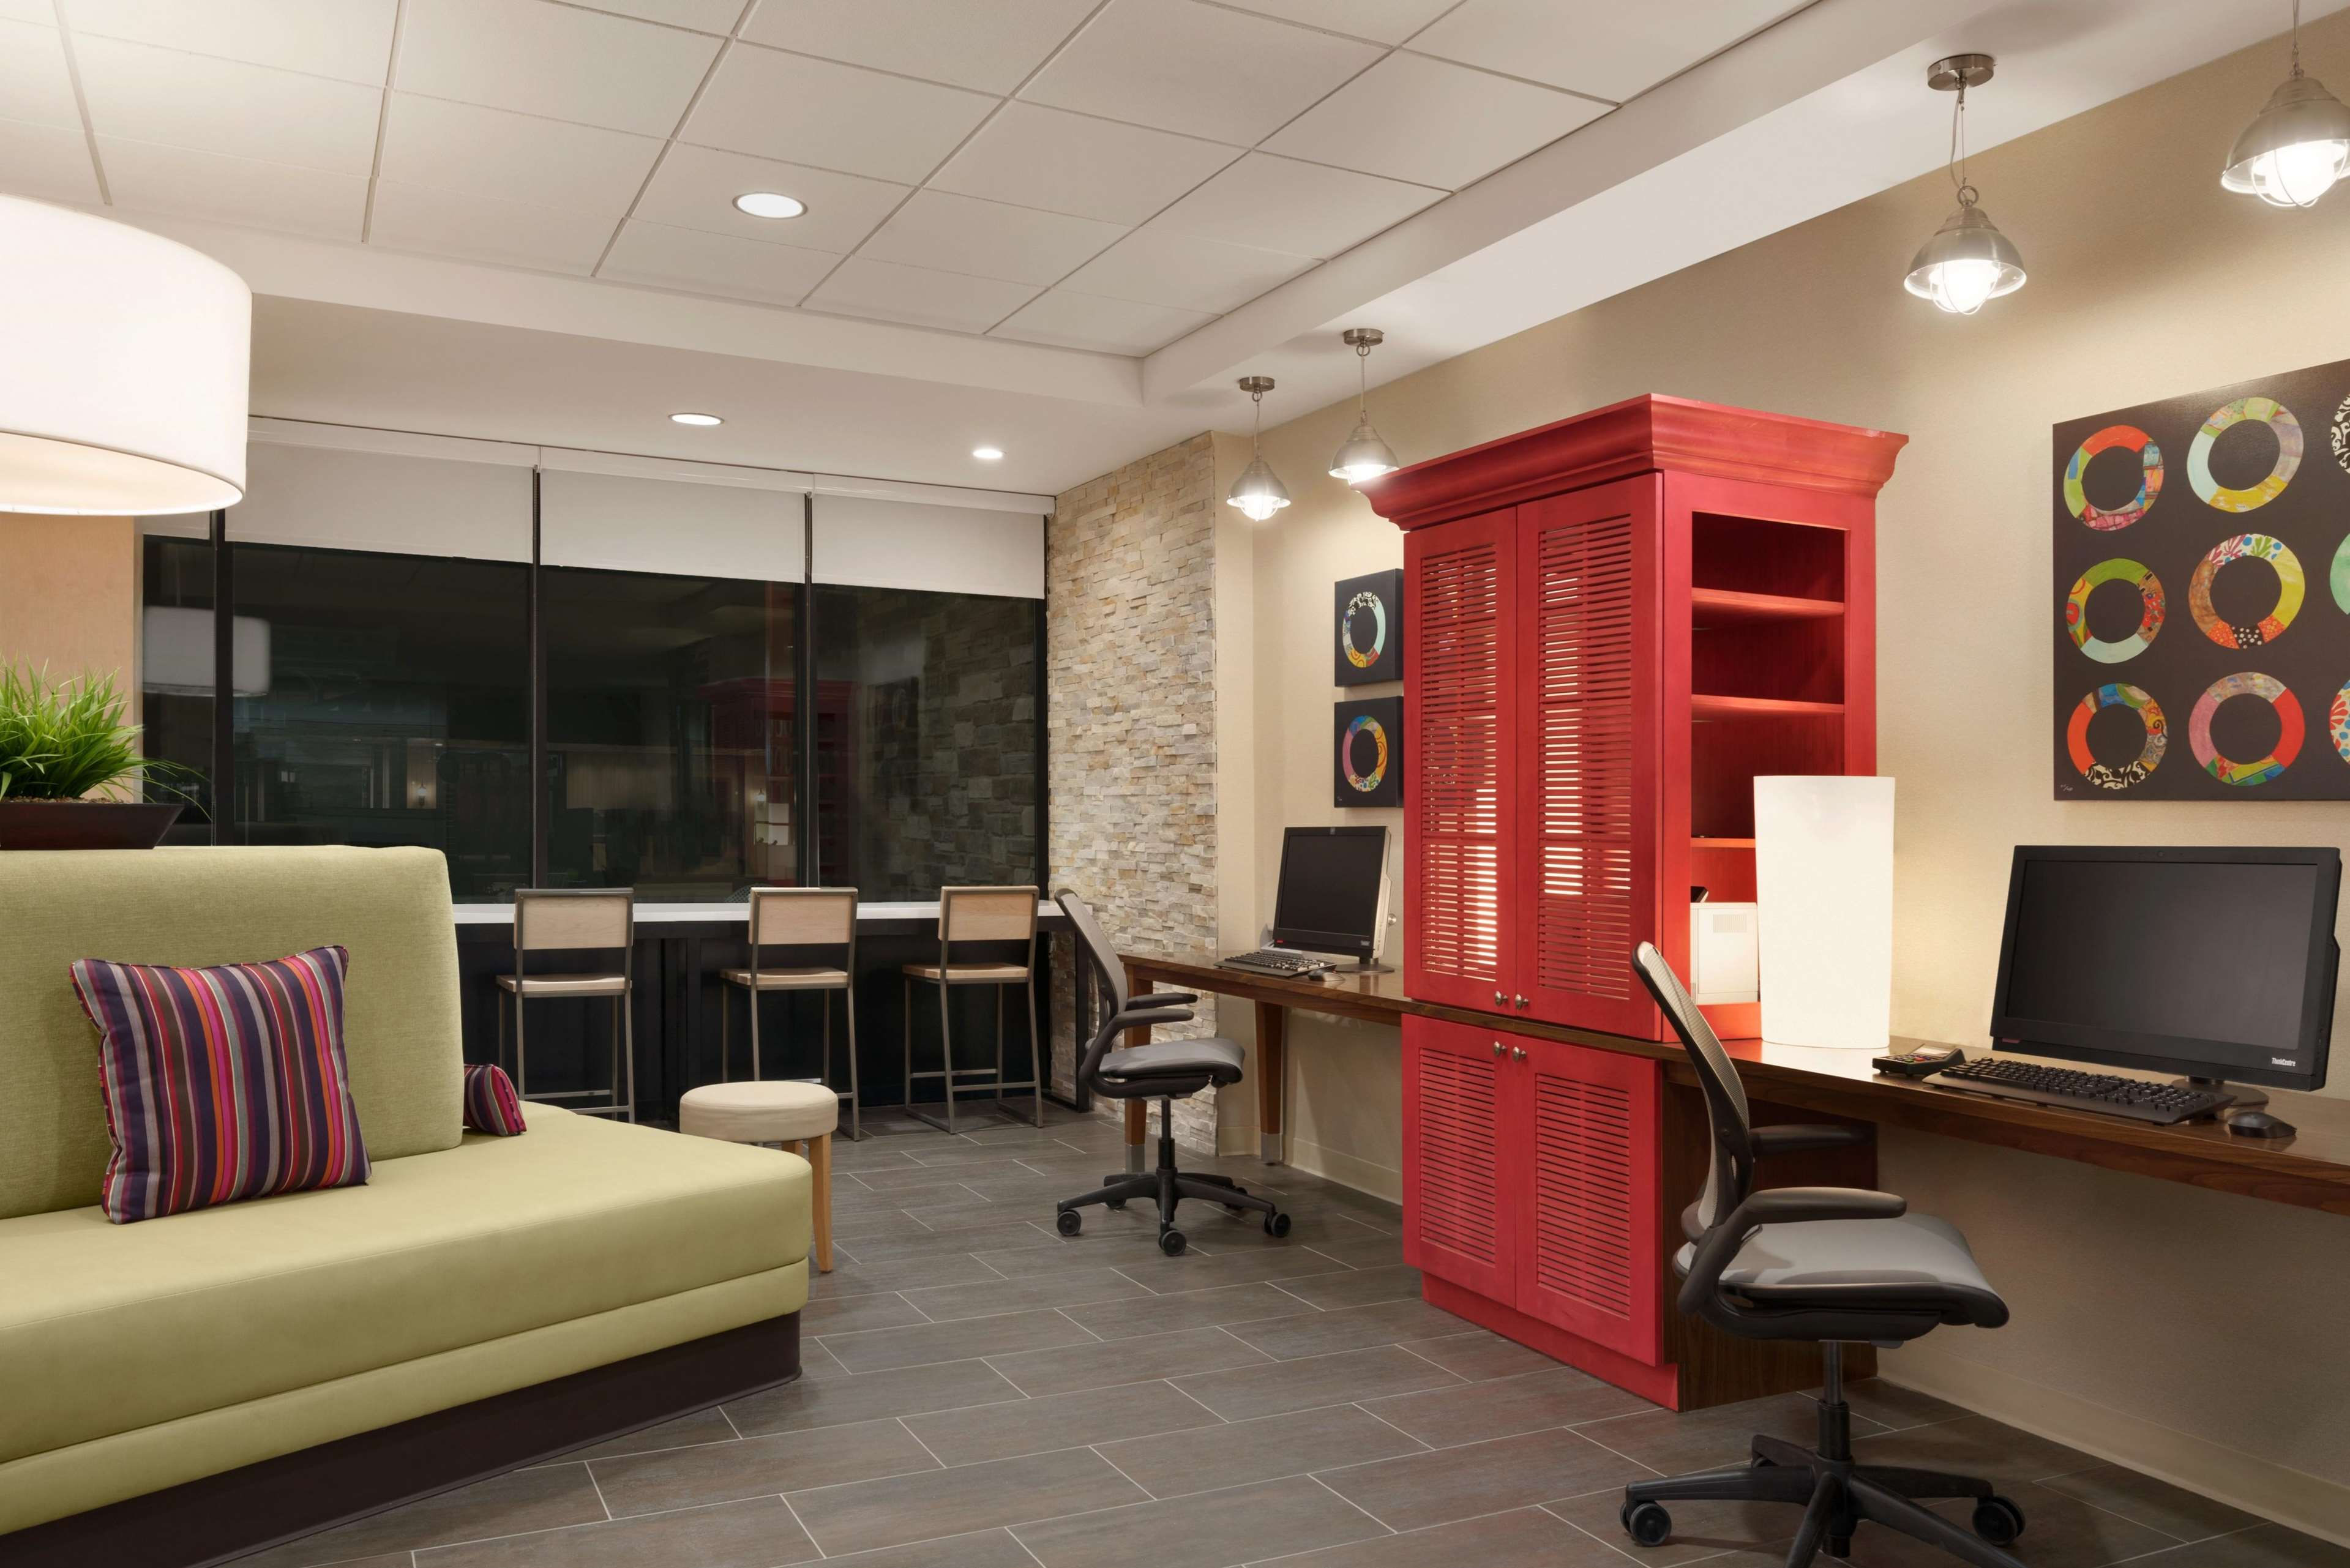 Home2 Suites by Hilton Leavenworth Downtown image 40